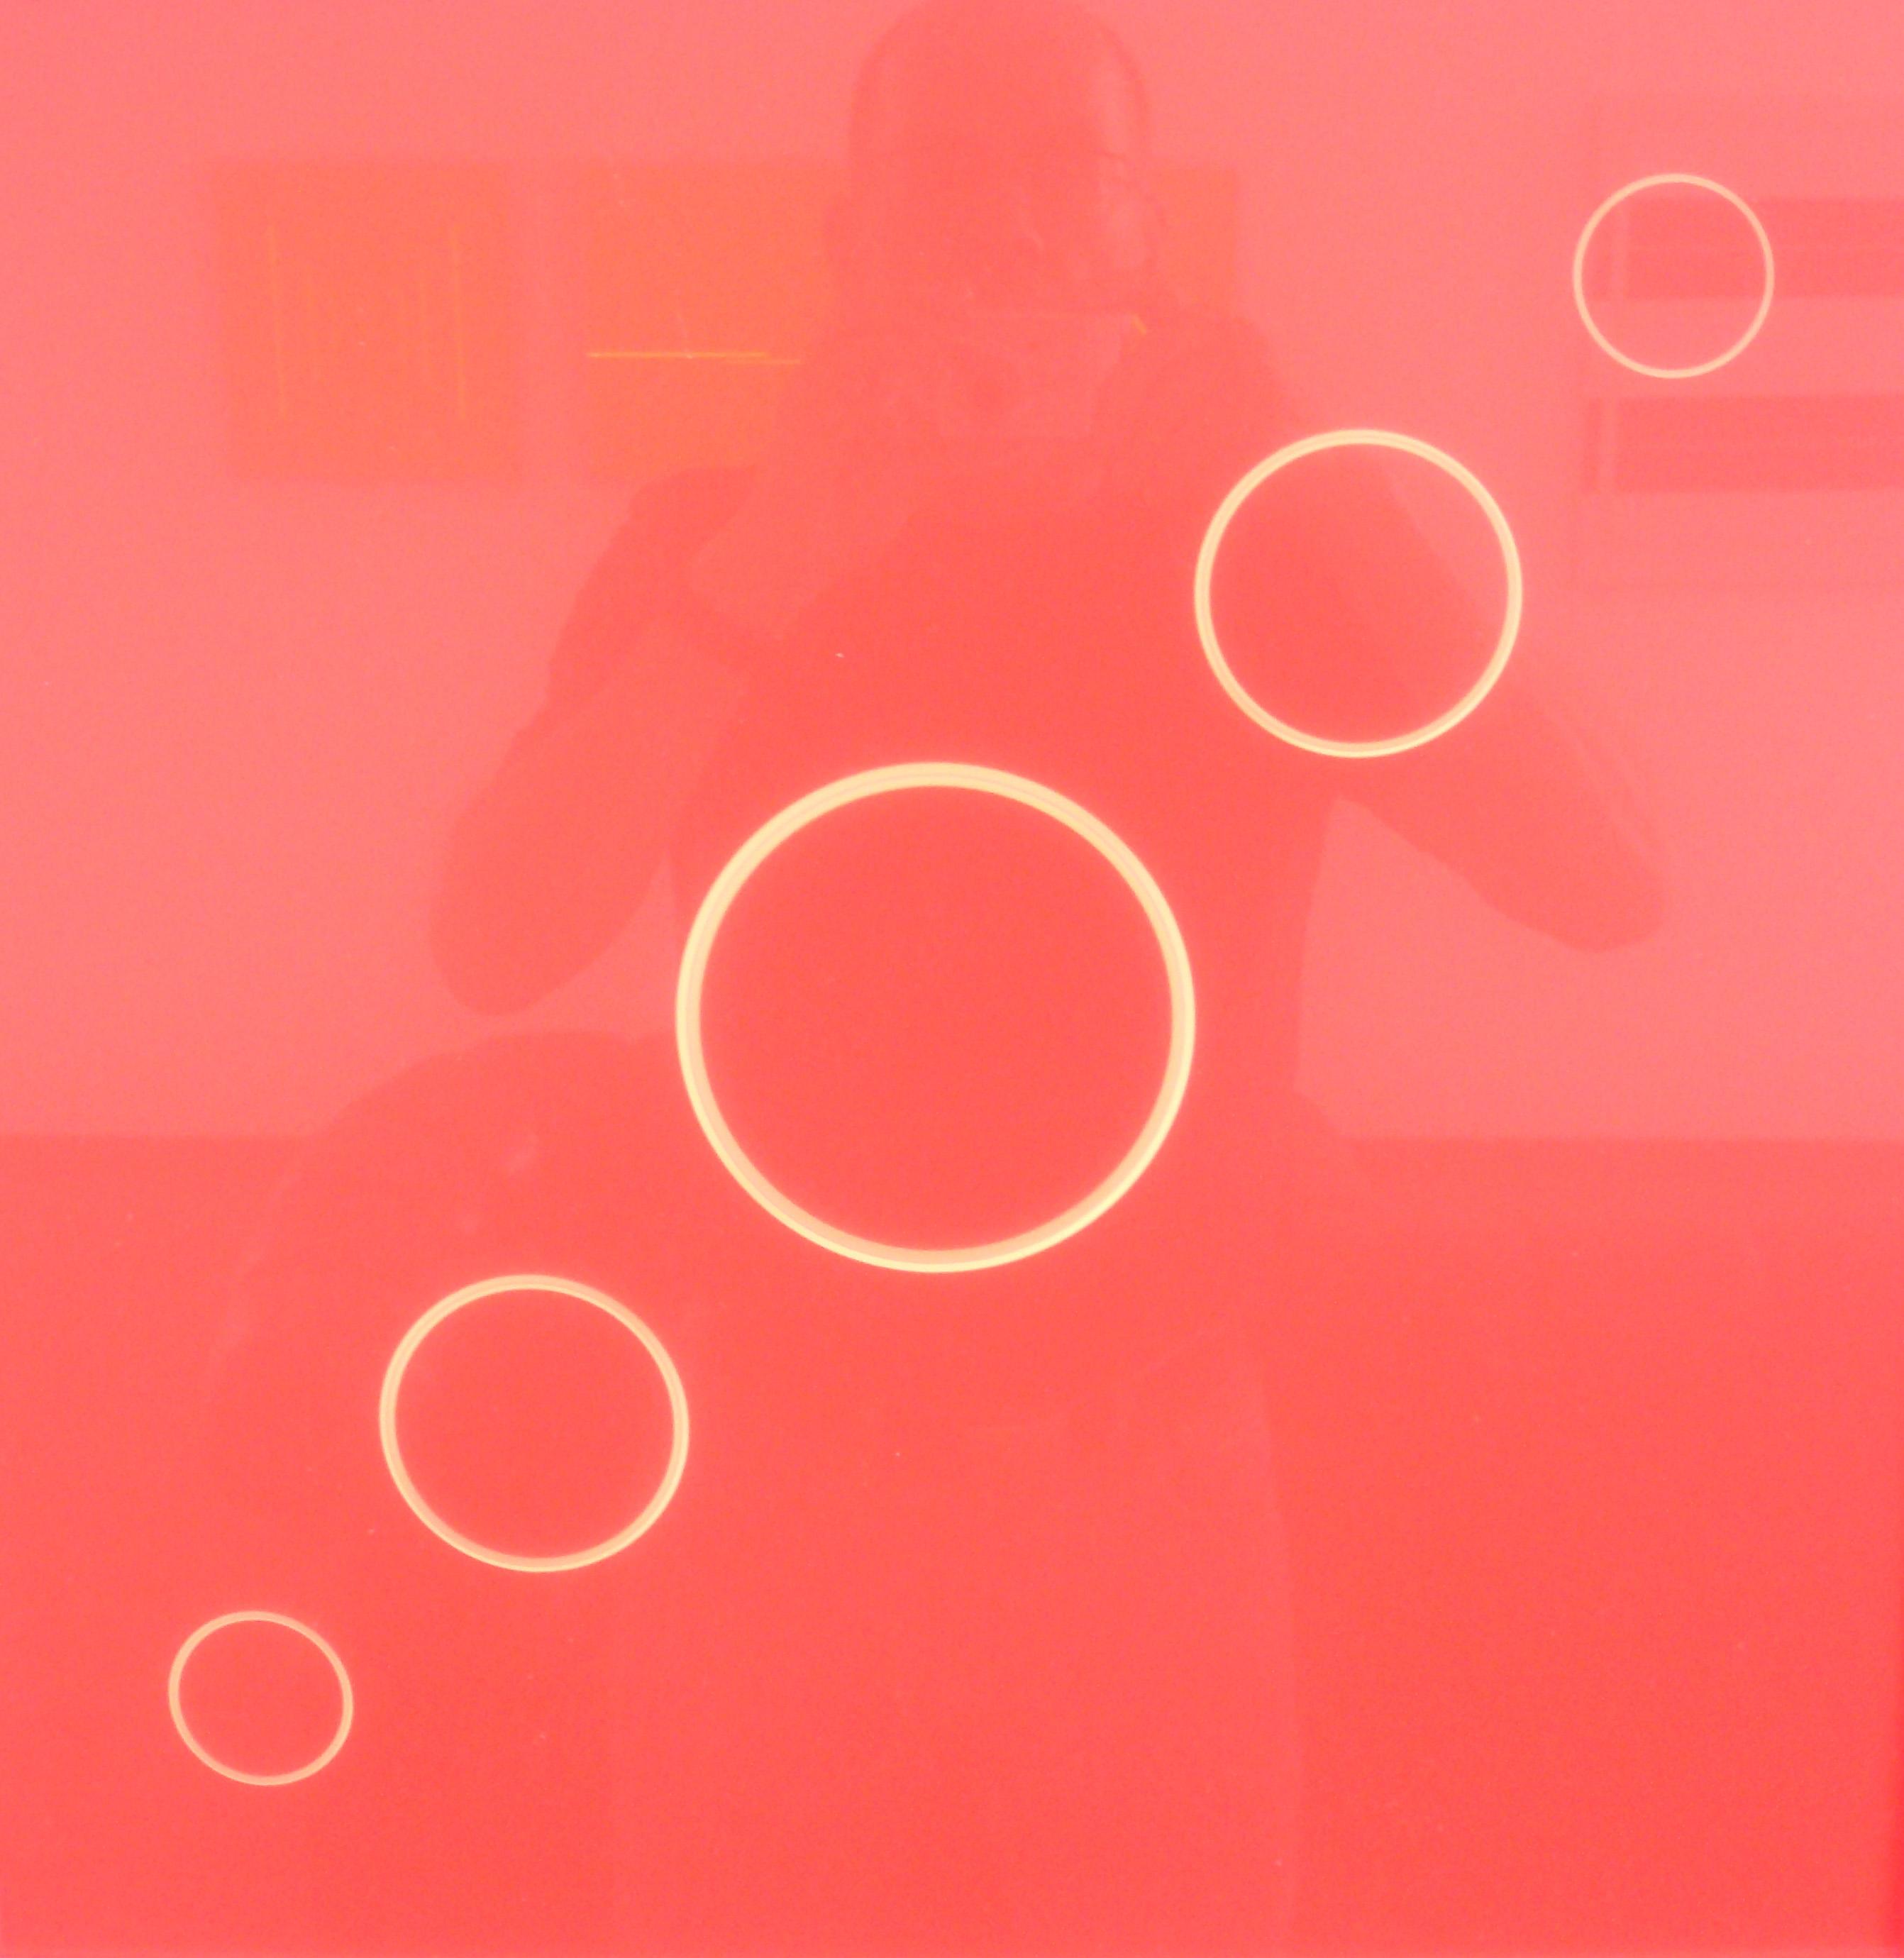 Hellmut Bruch - Diagonal oder Horizontal